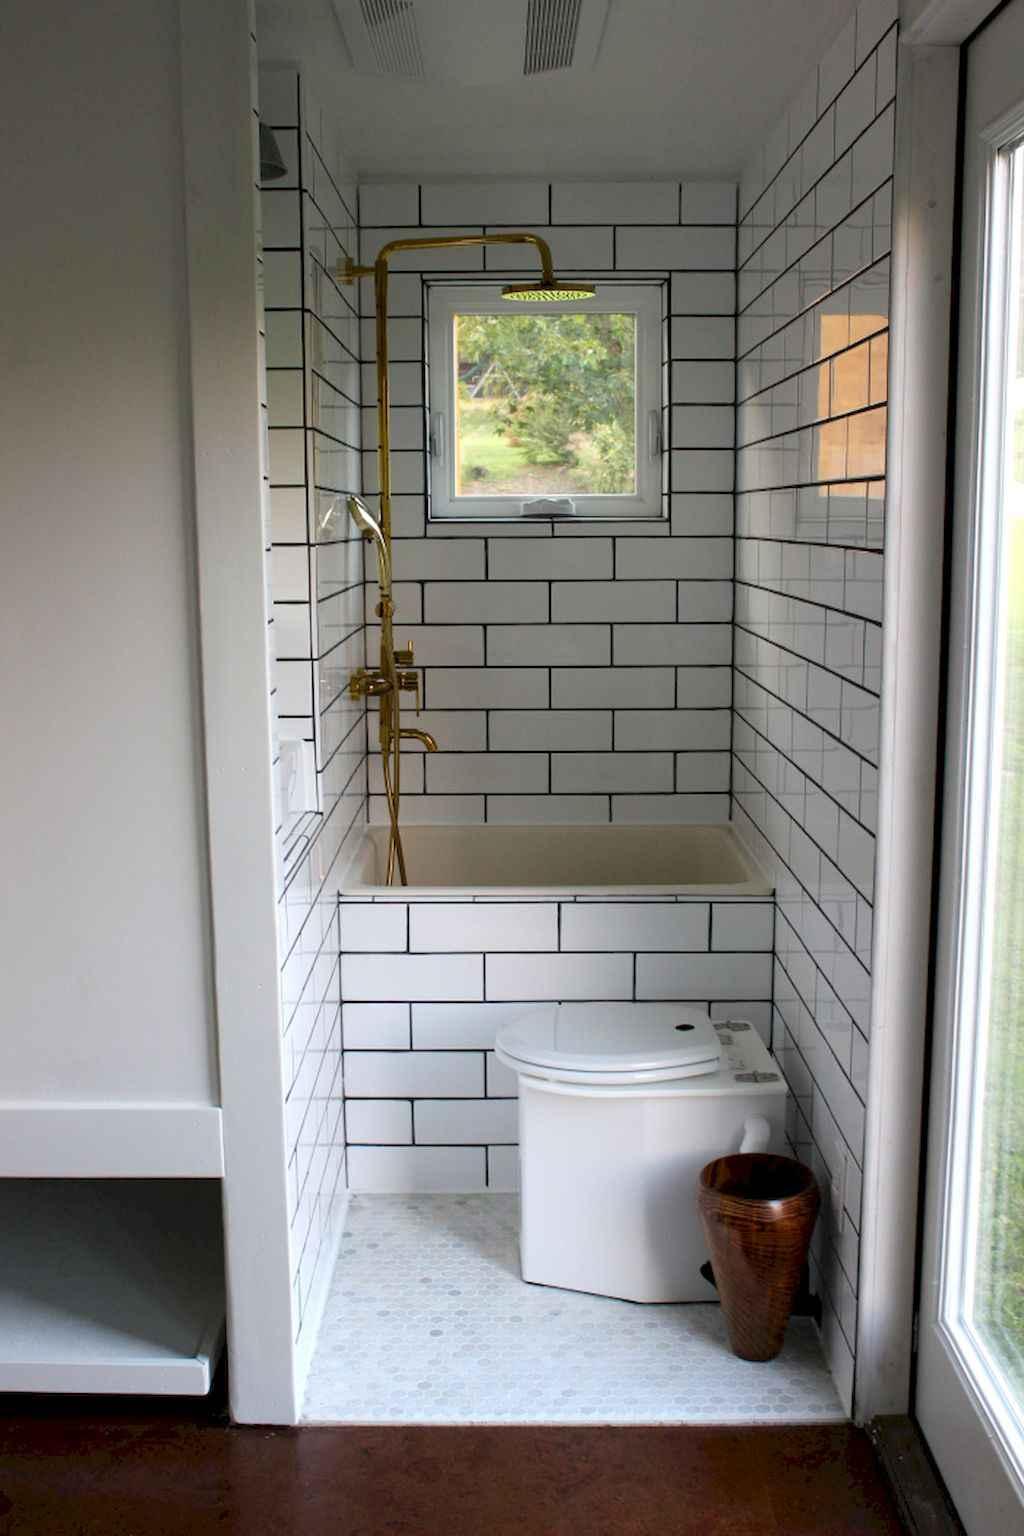 Genius tiny bathroom designs with space saving 24 for Space saving bathroom designs